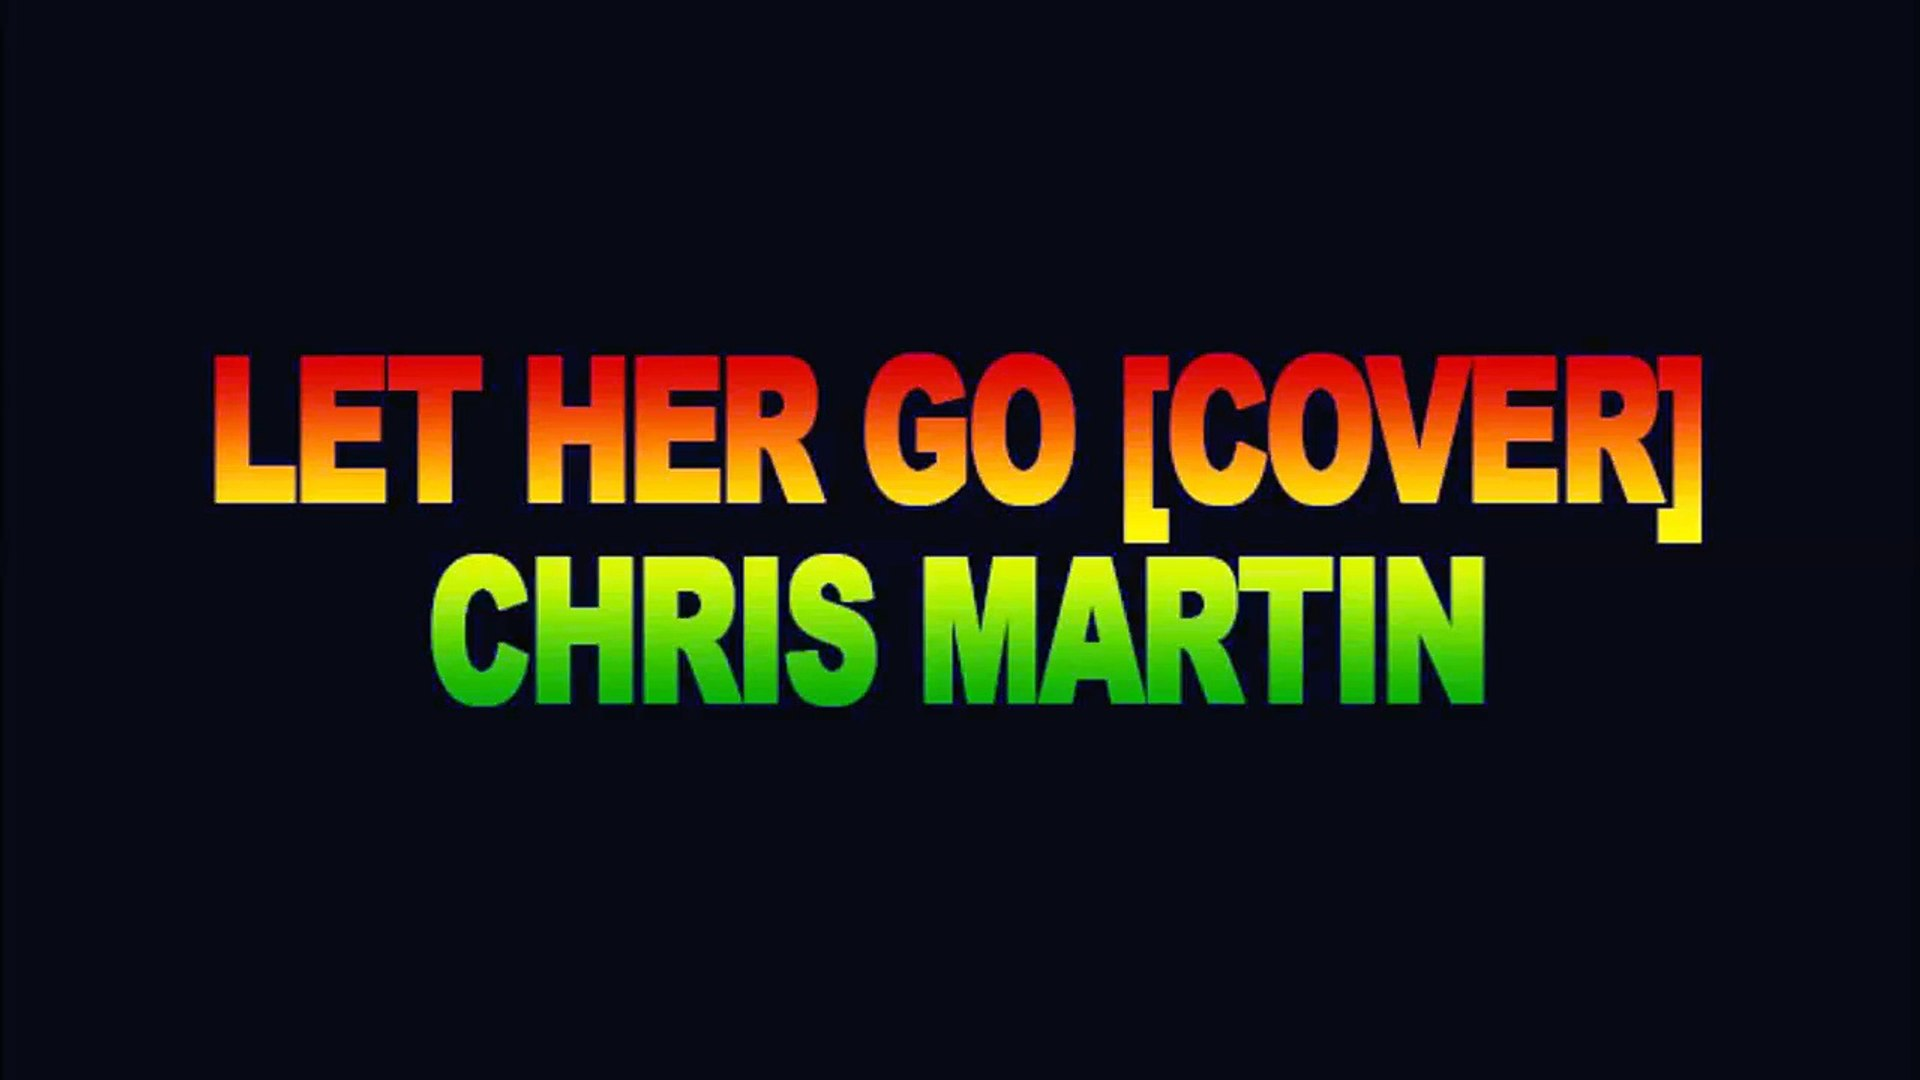 Let Her Go (Reggae Cover) - Chris Martin [Nov 2013]